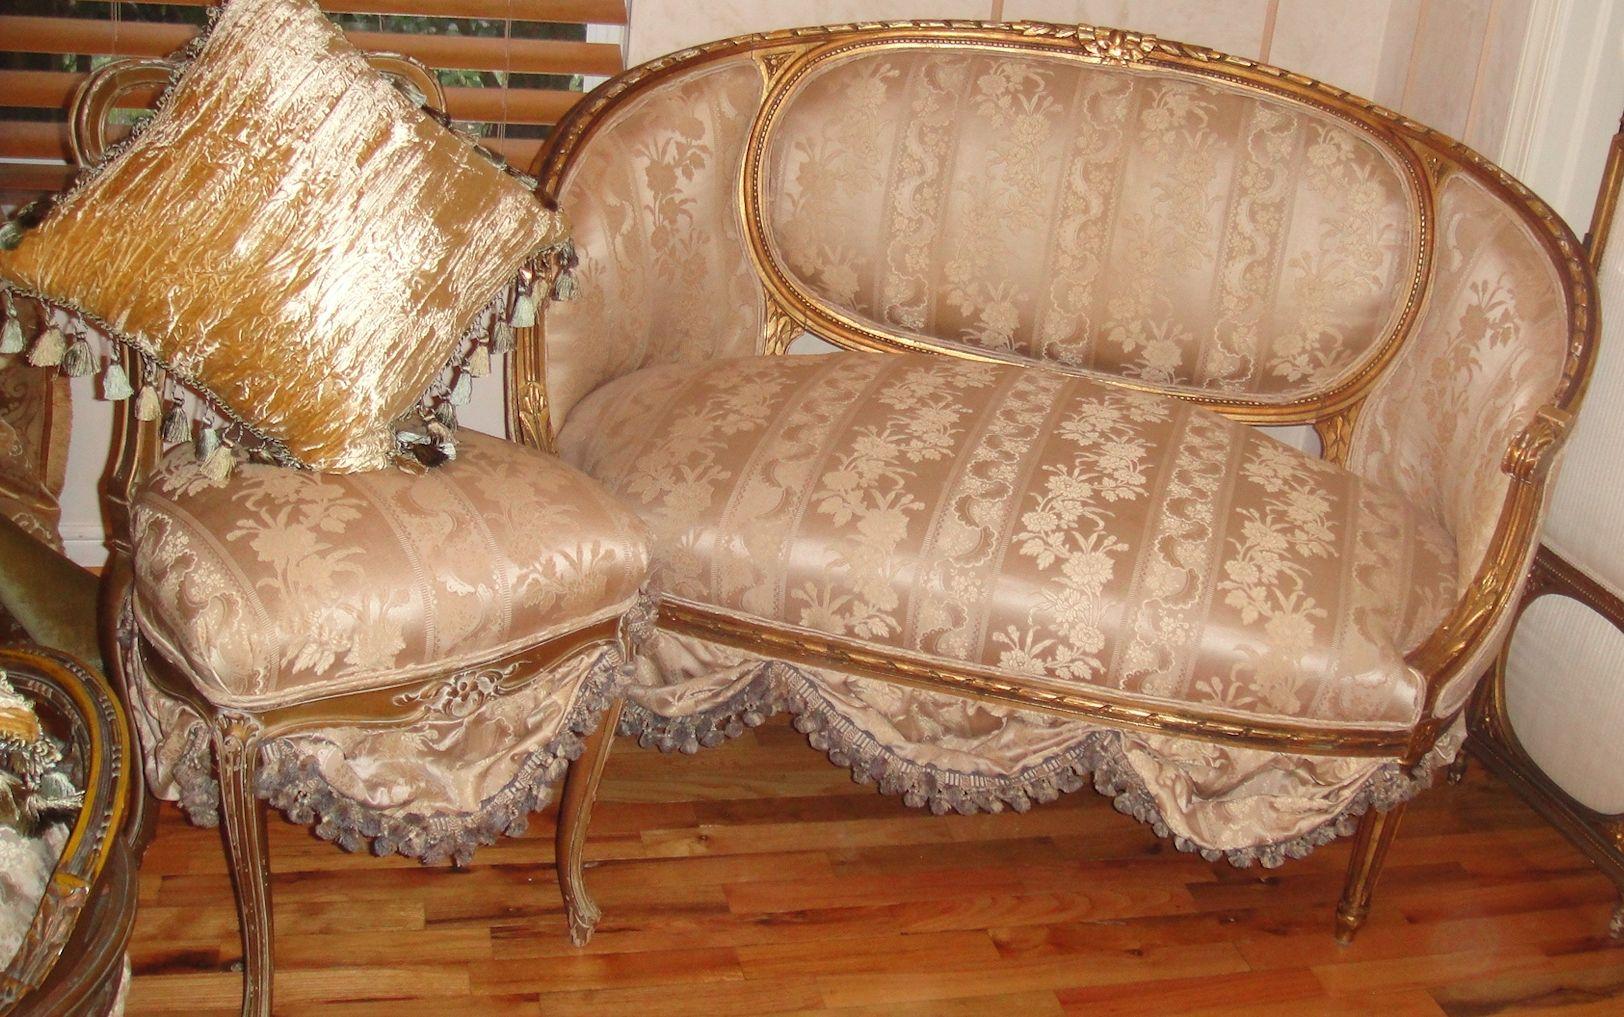 antique french sofa ebay furnicity fabric 3 2 grey set settee loveseat circa 1800 39s scallops